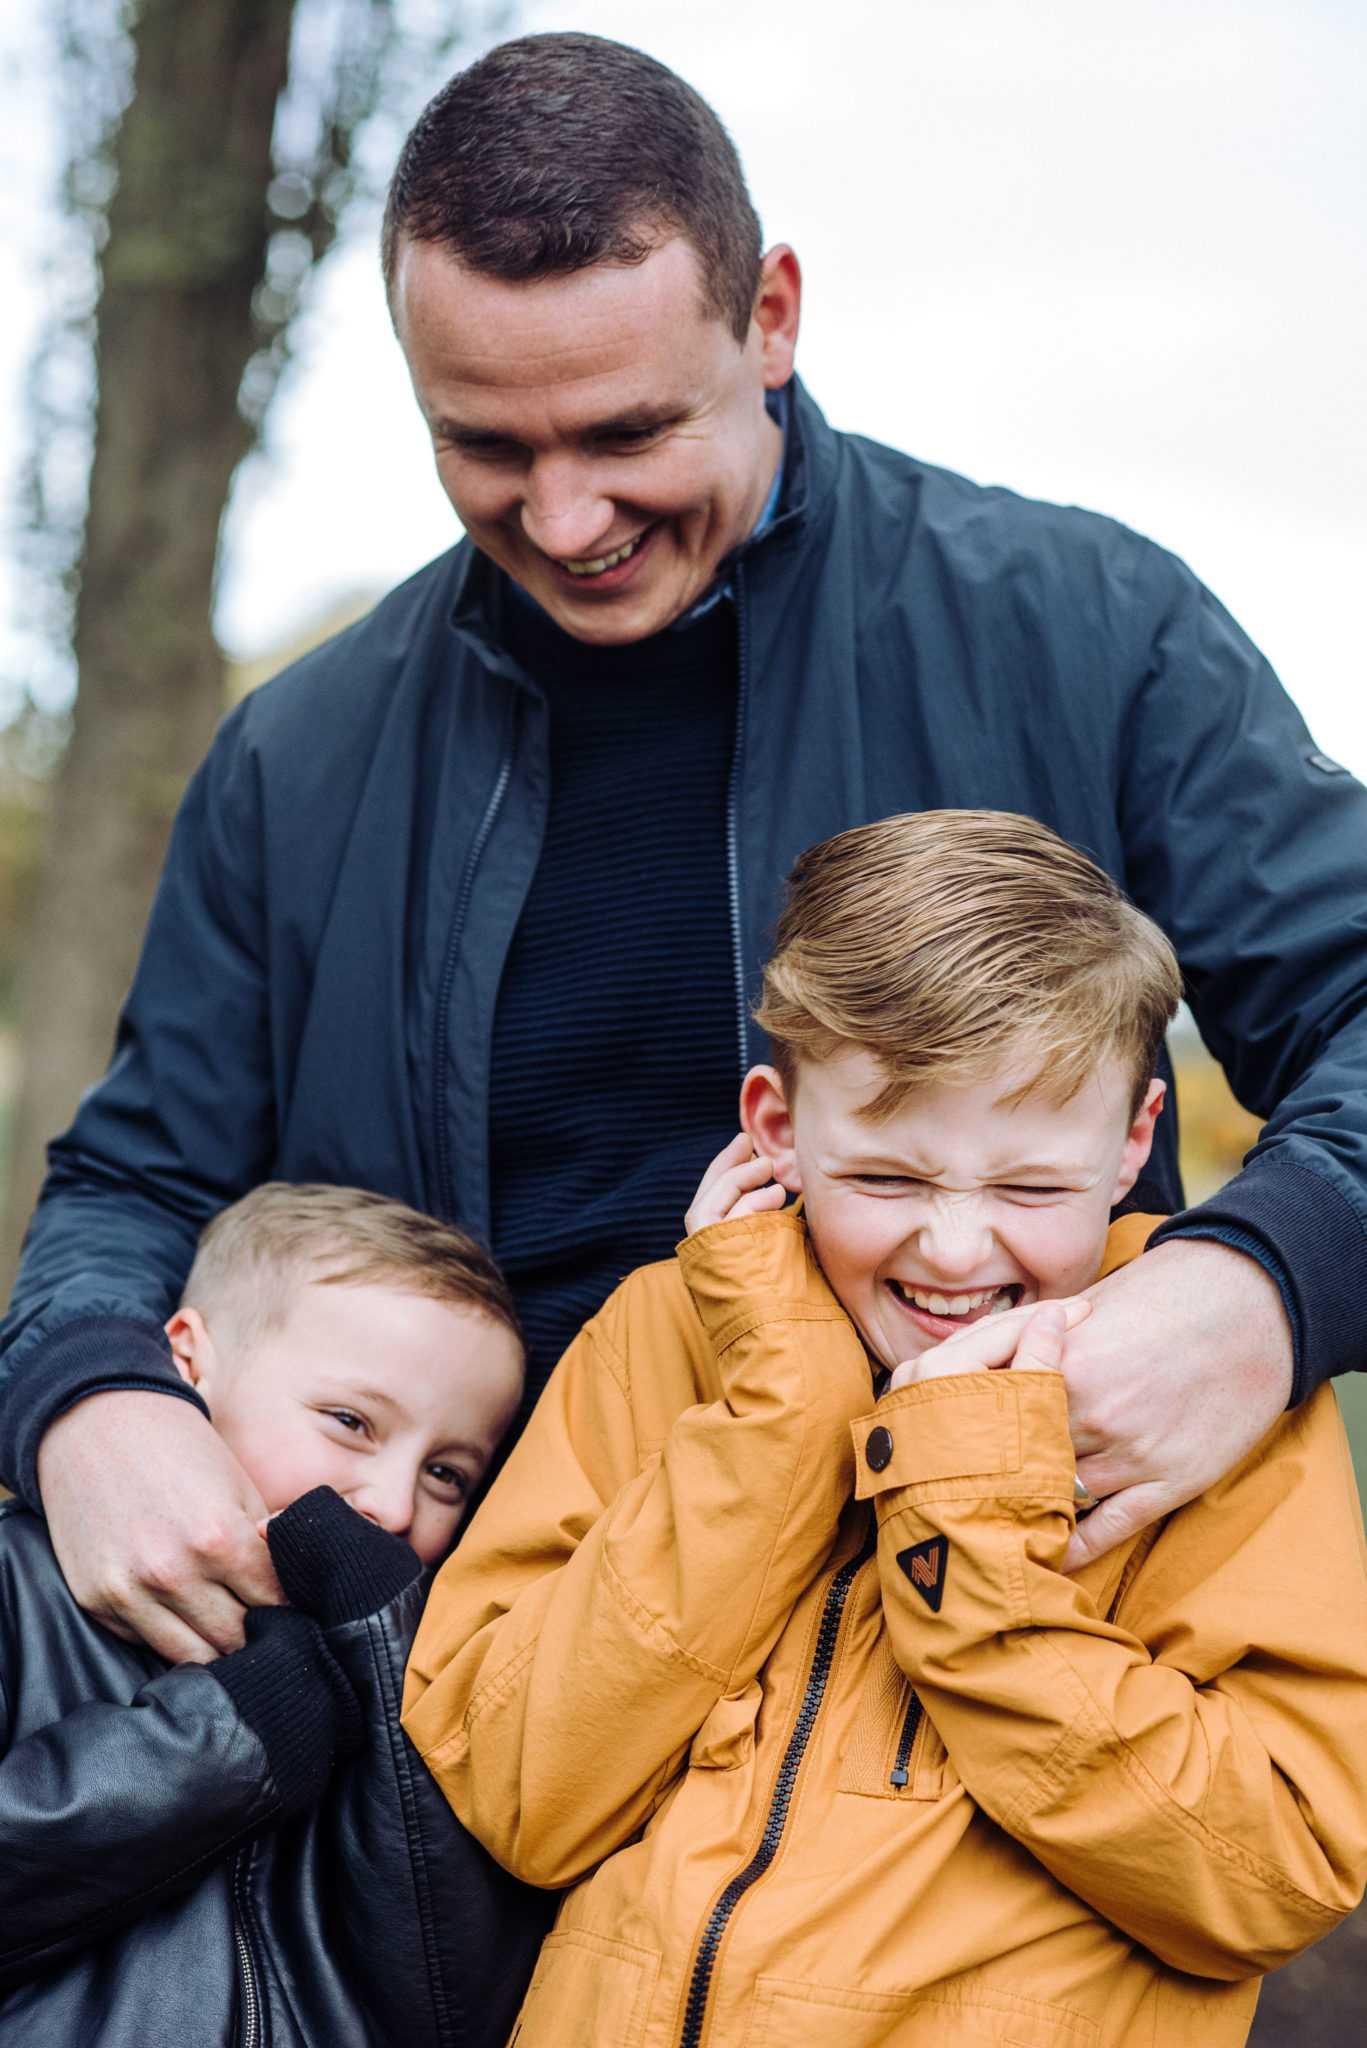 Professional Family Portraits Stockport